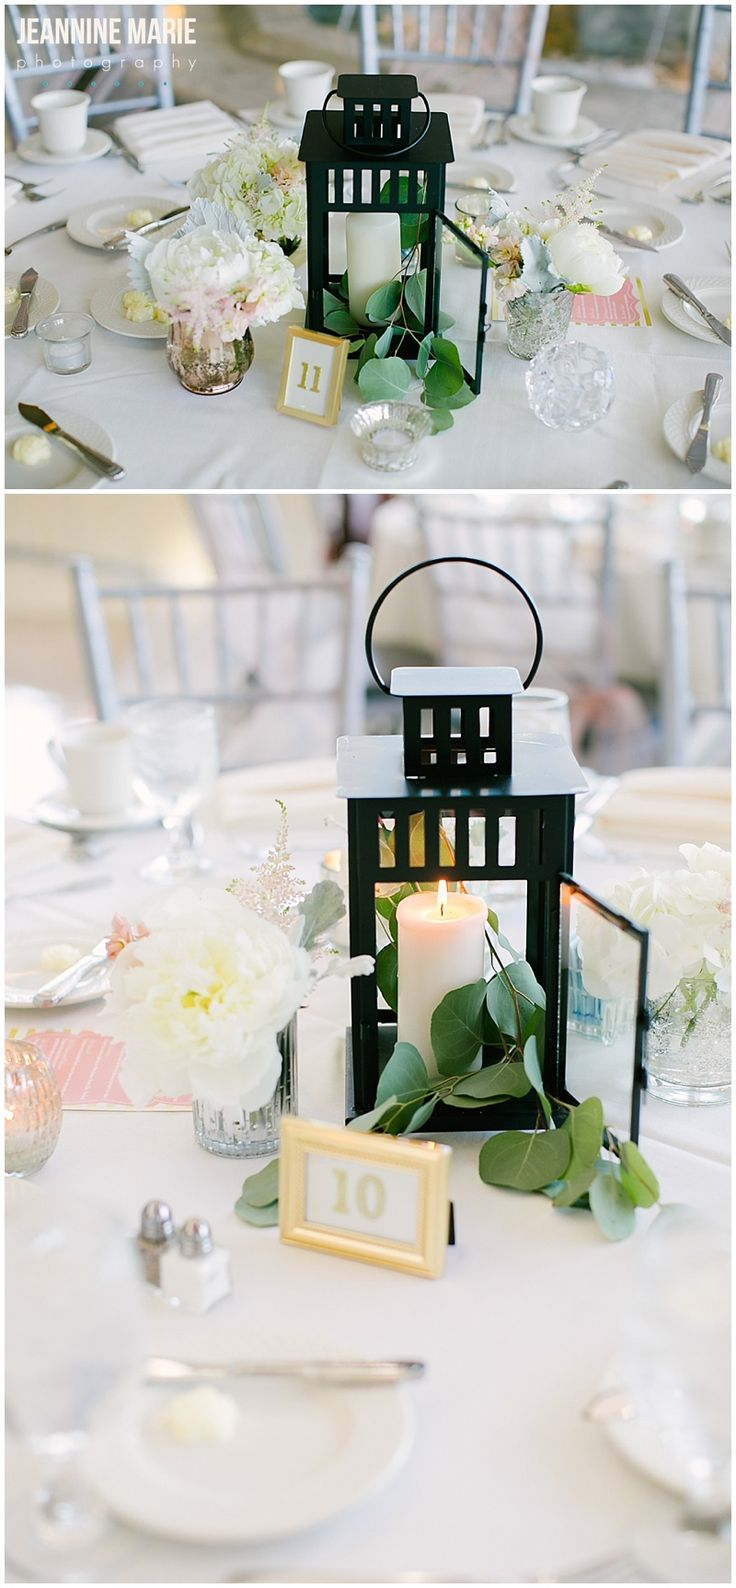 wedding reception minnetonkmn%0A Lantern centerpieces for a wedding reception at Carlson Towers in Minnetonka   MN u